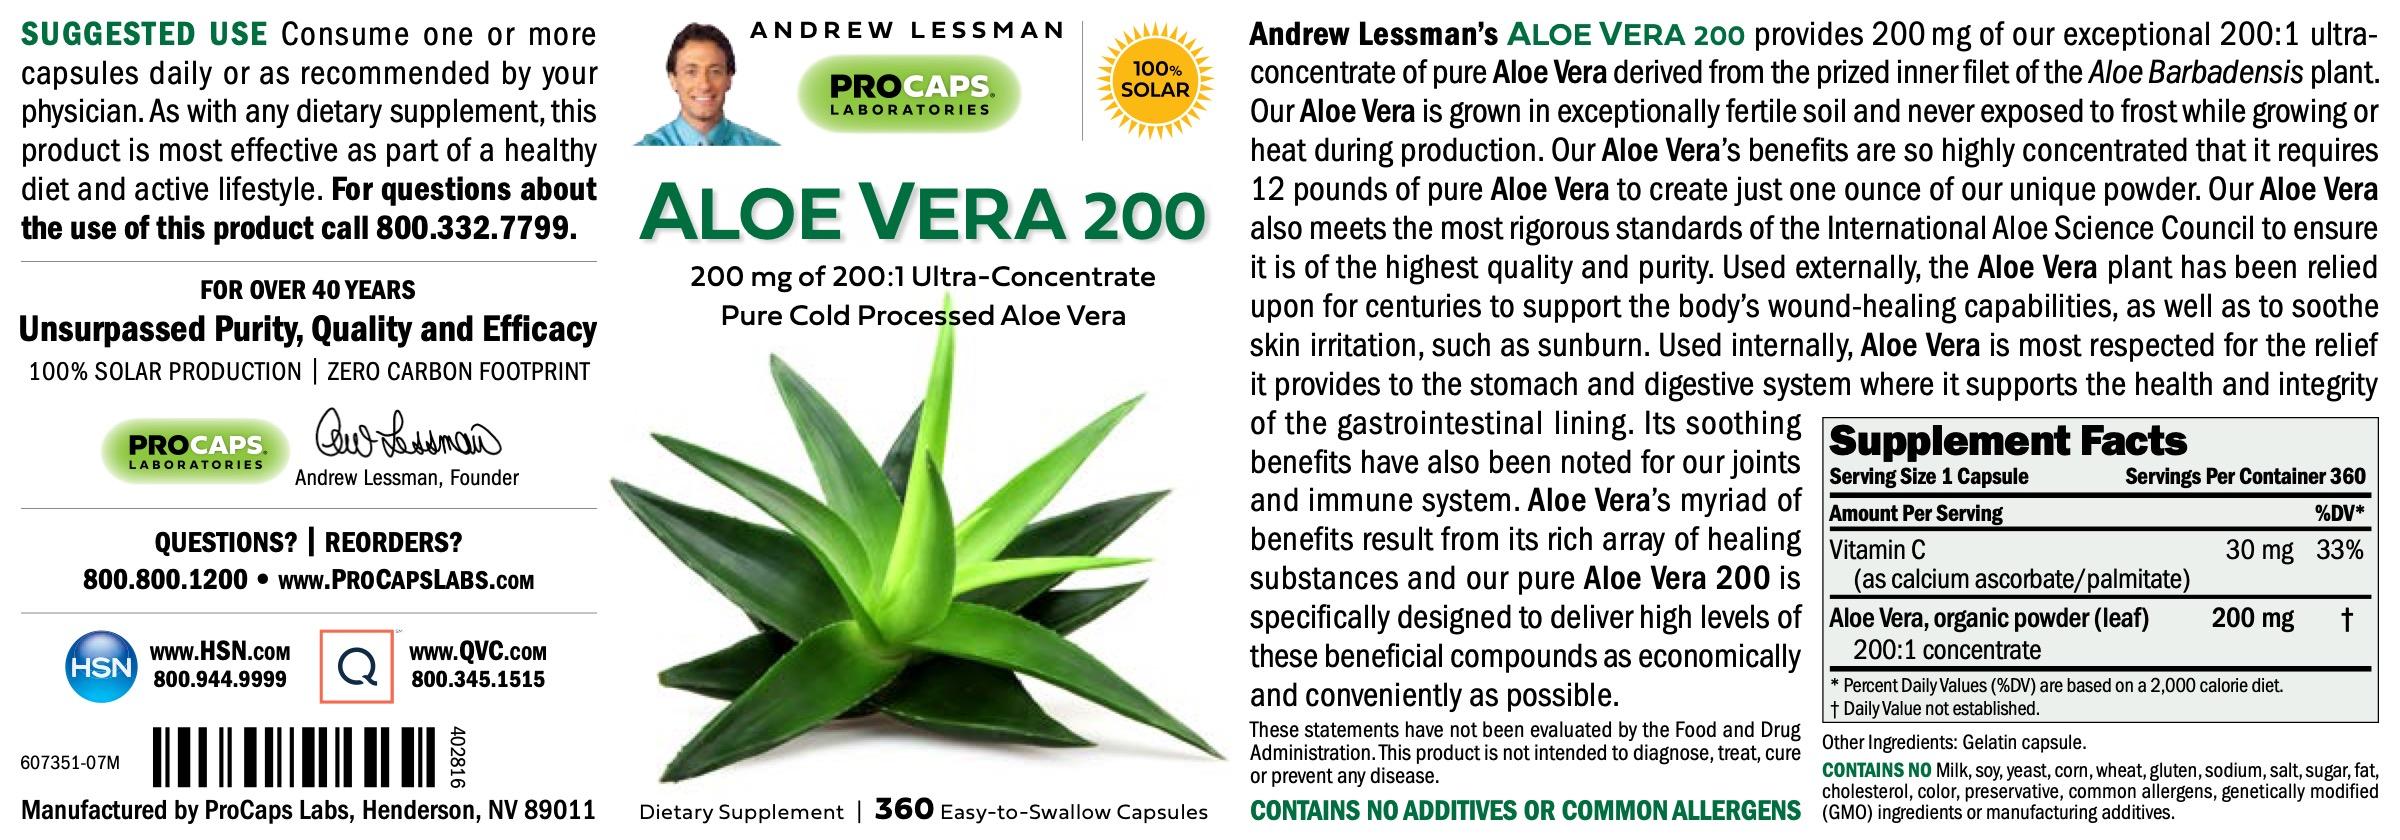 Aloe-Vera-200-Capsules-Digestive-Support